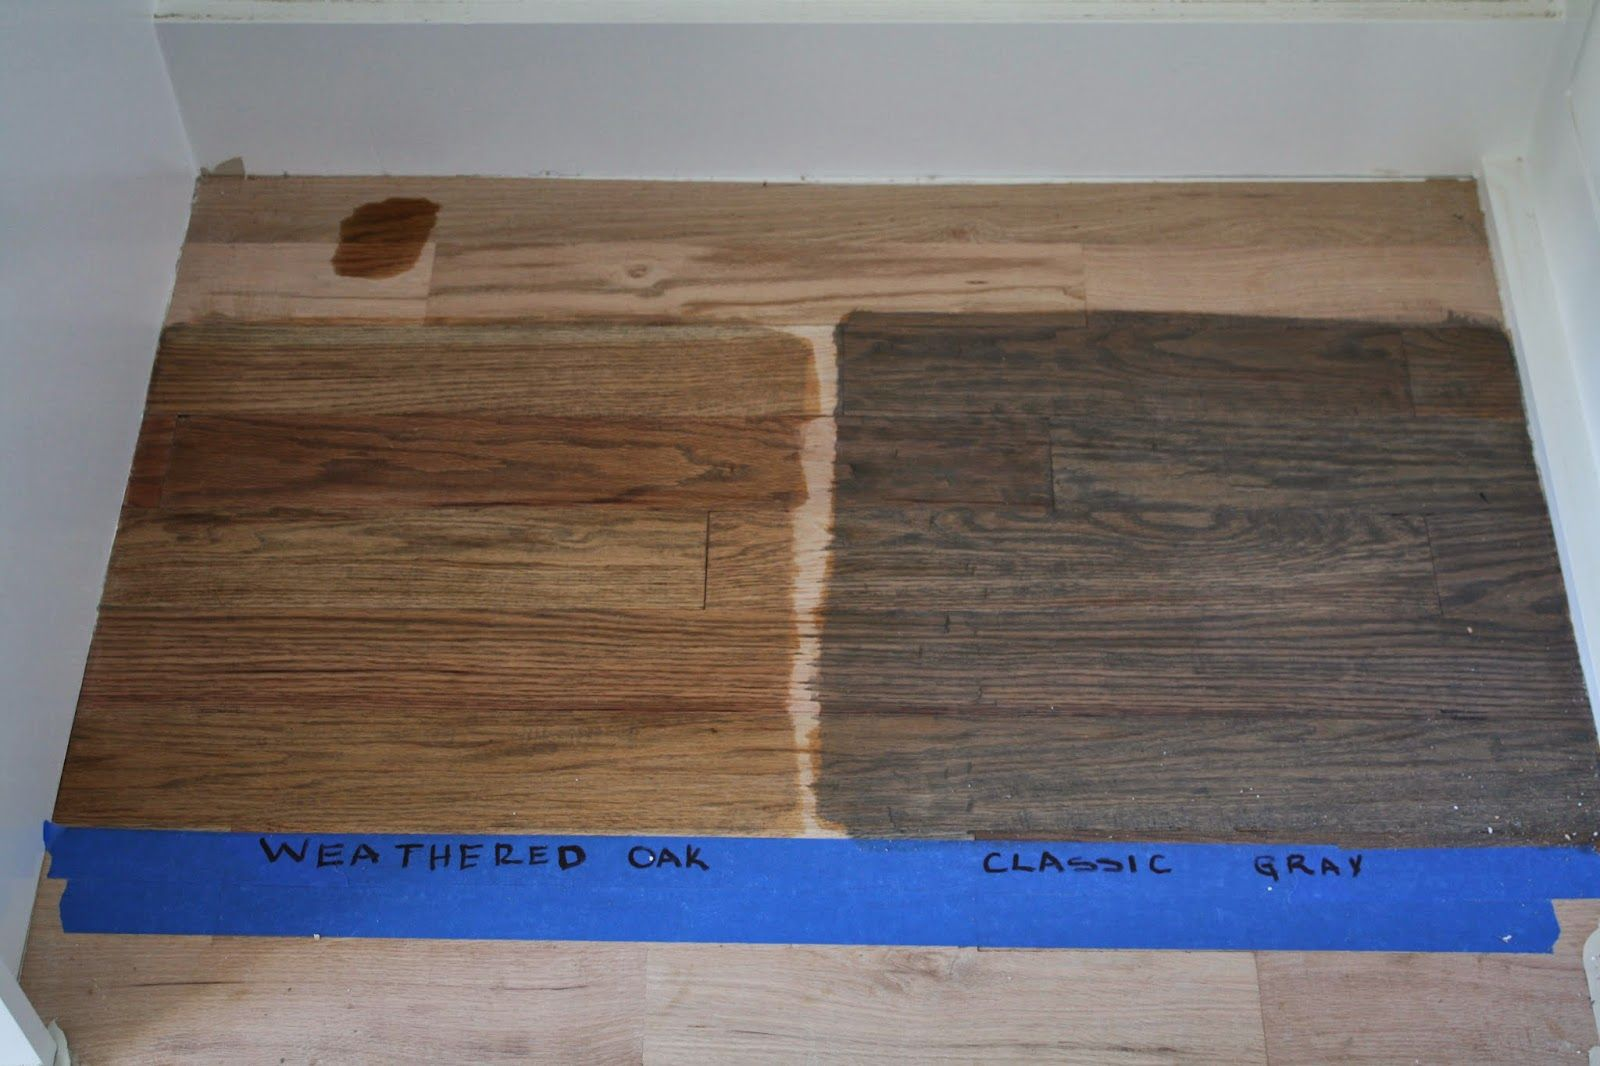 Weathered Oak And Classic Grey Minwax Weathered Oak Stain Red Oak Hardwood Floors Weathered Oak